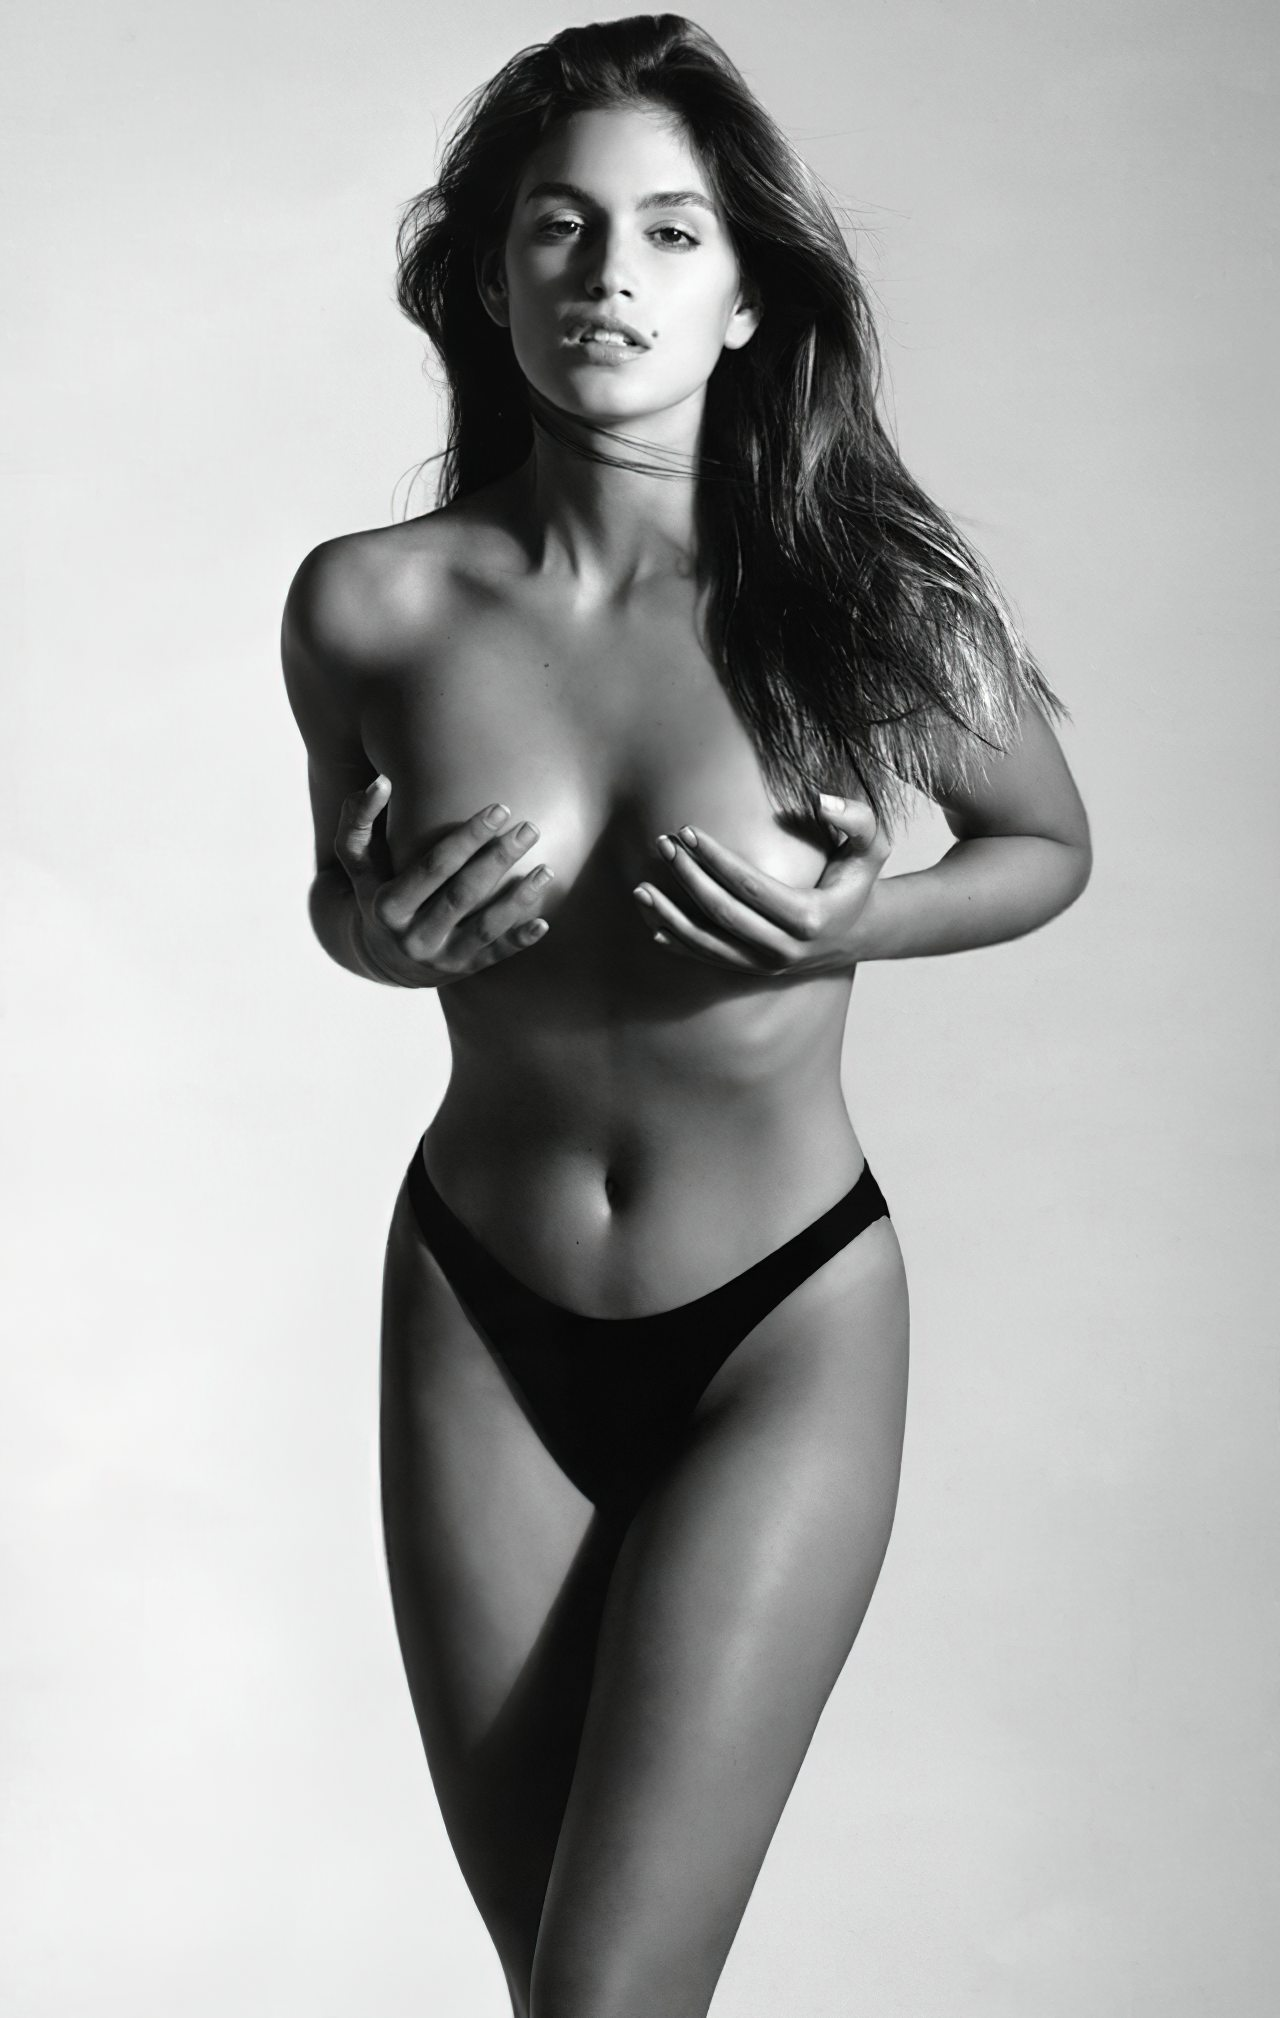 Fotos de Mulheres (13)